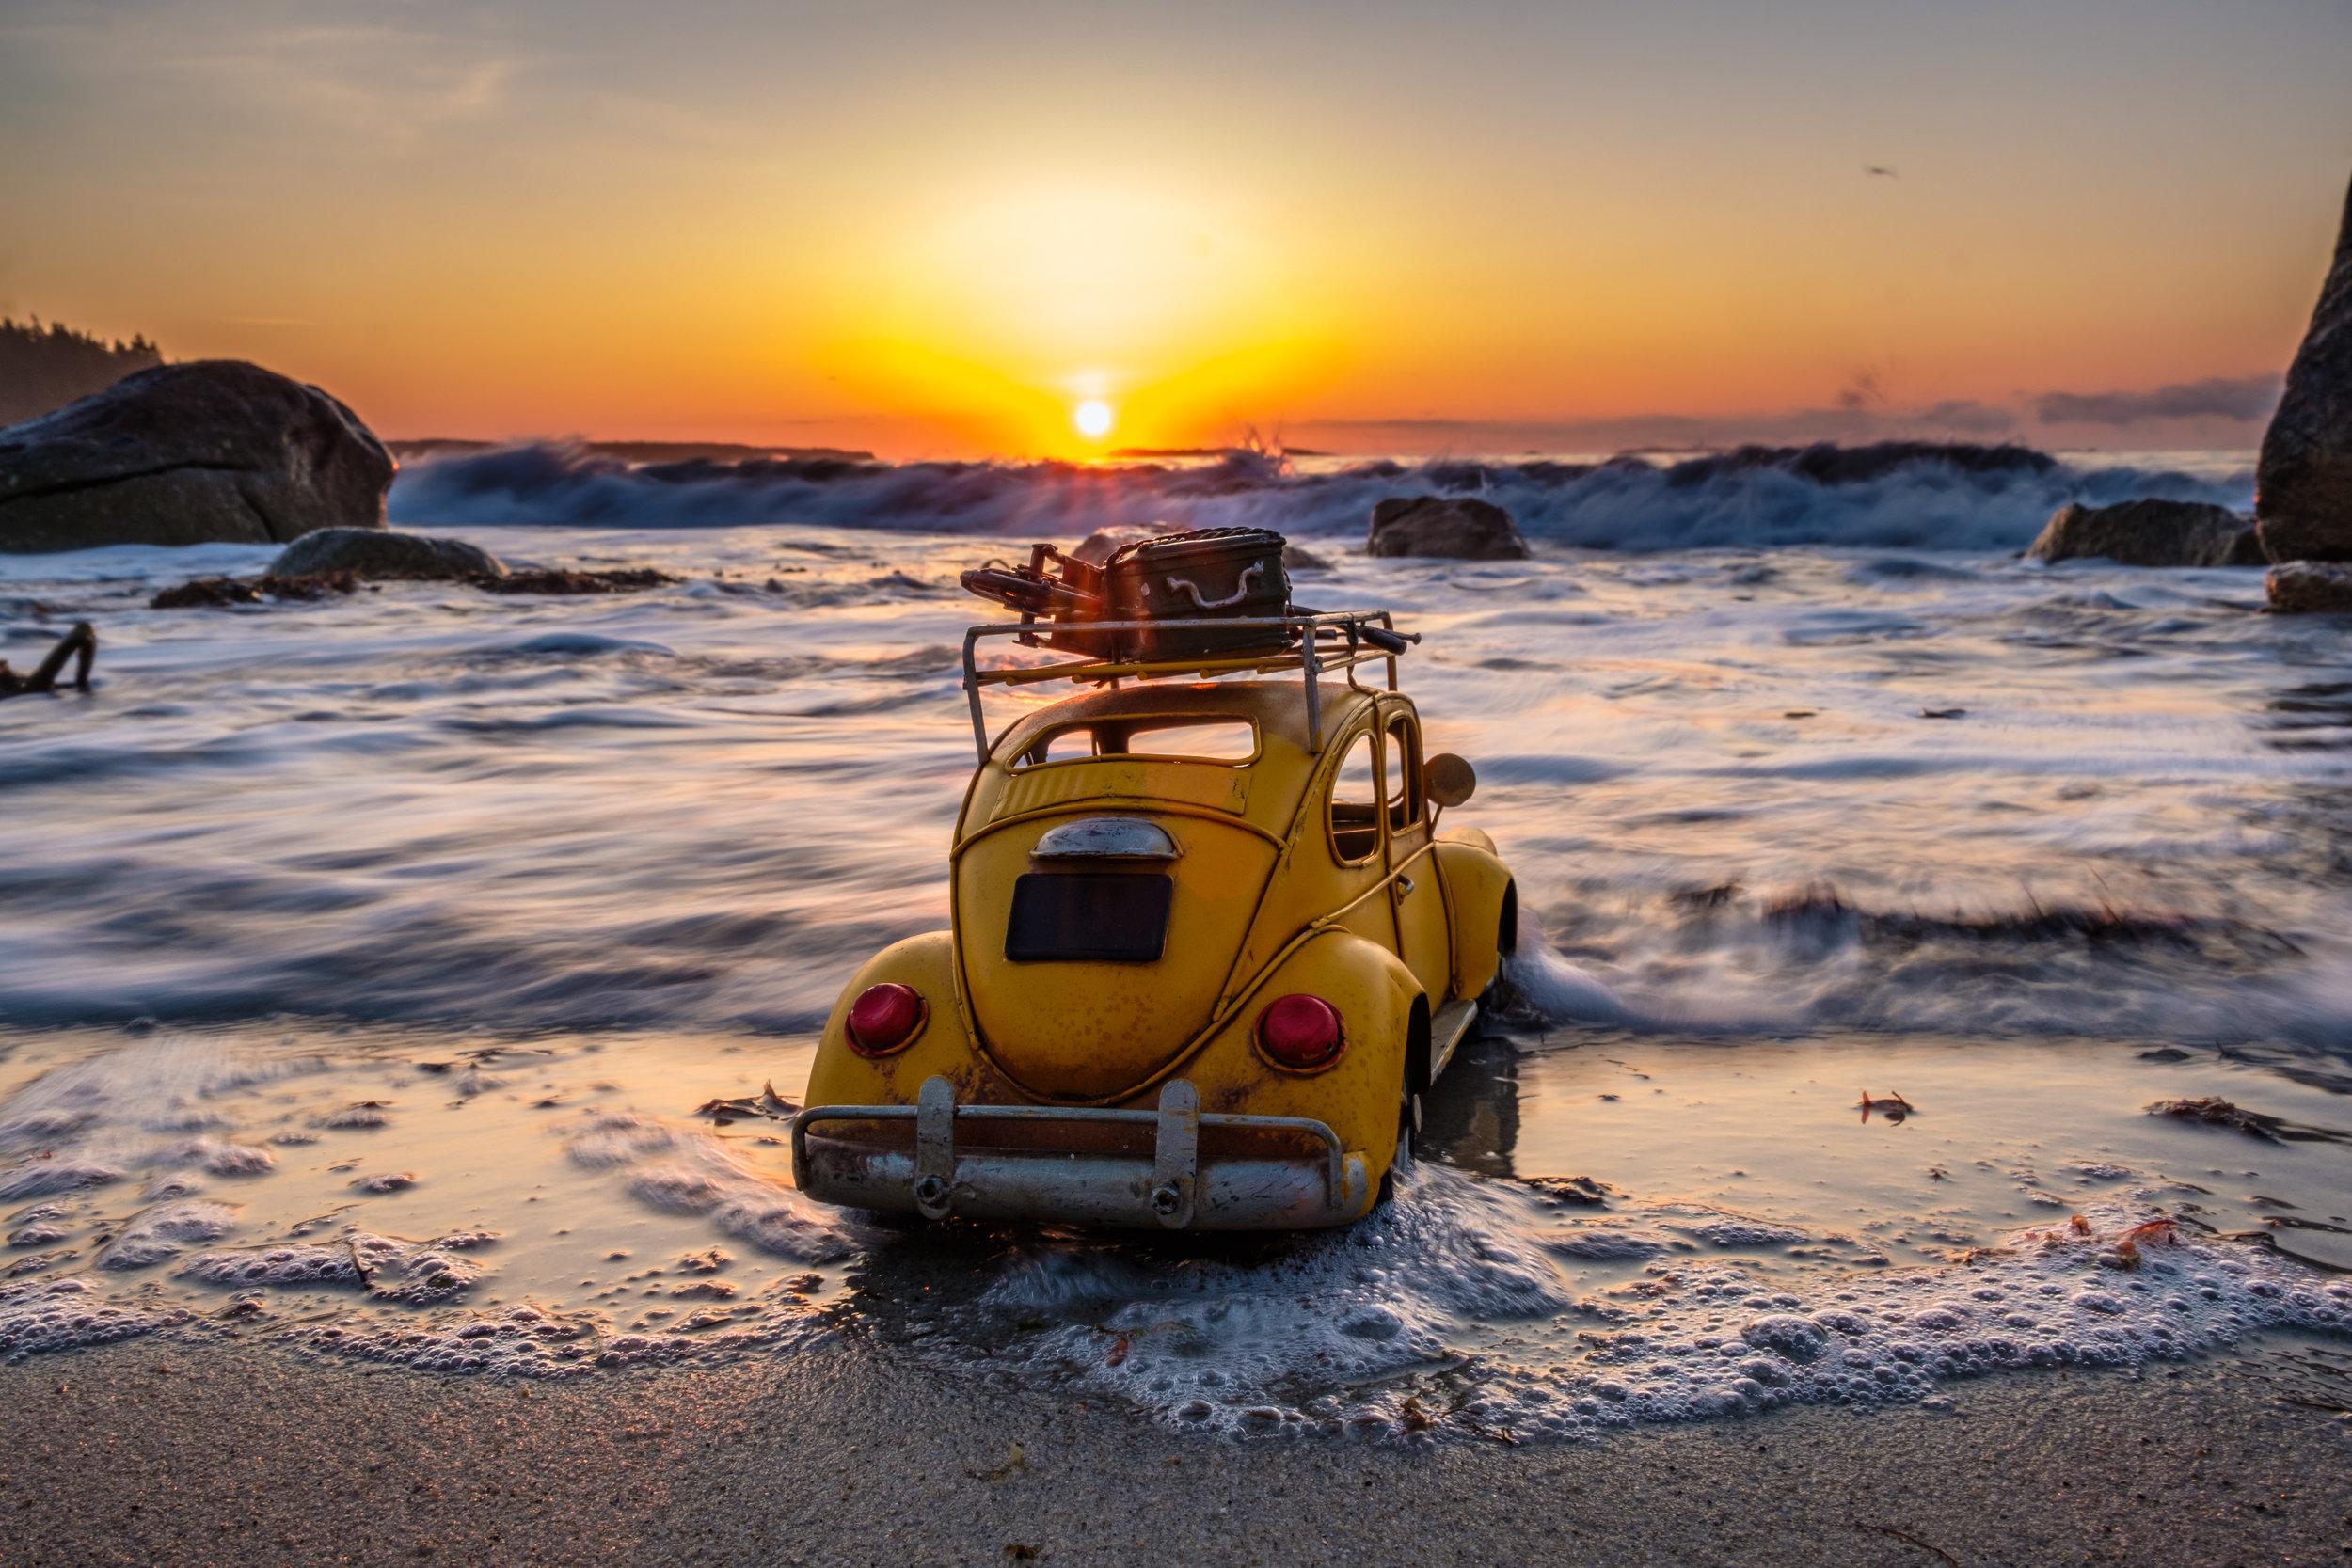 VDub_Willie, Crystal Crescent Beach, Nova Scotia